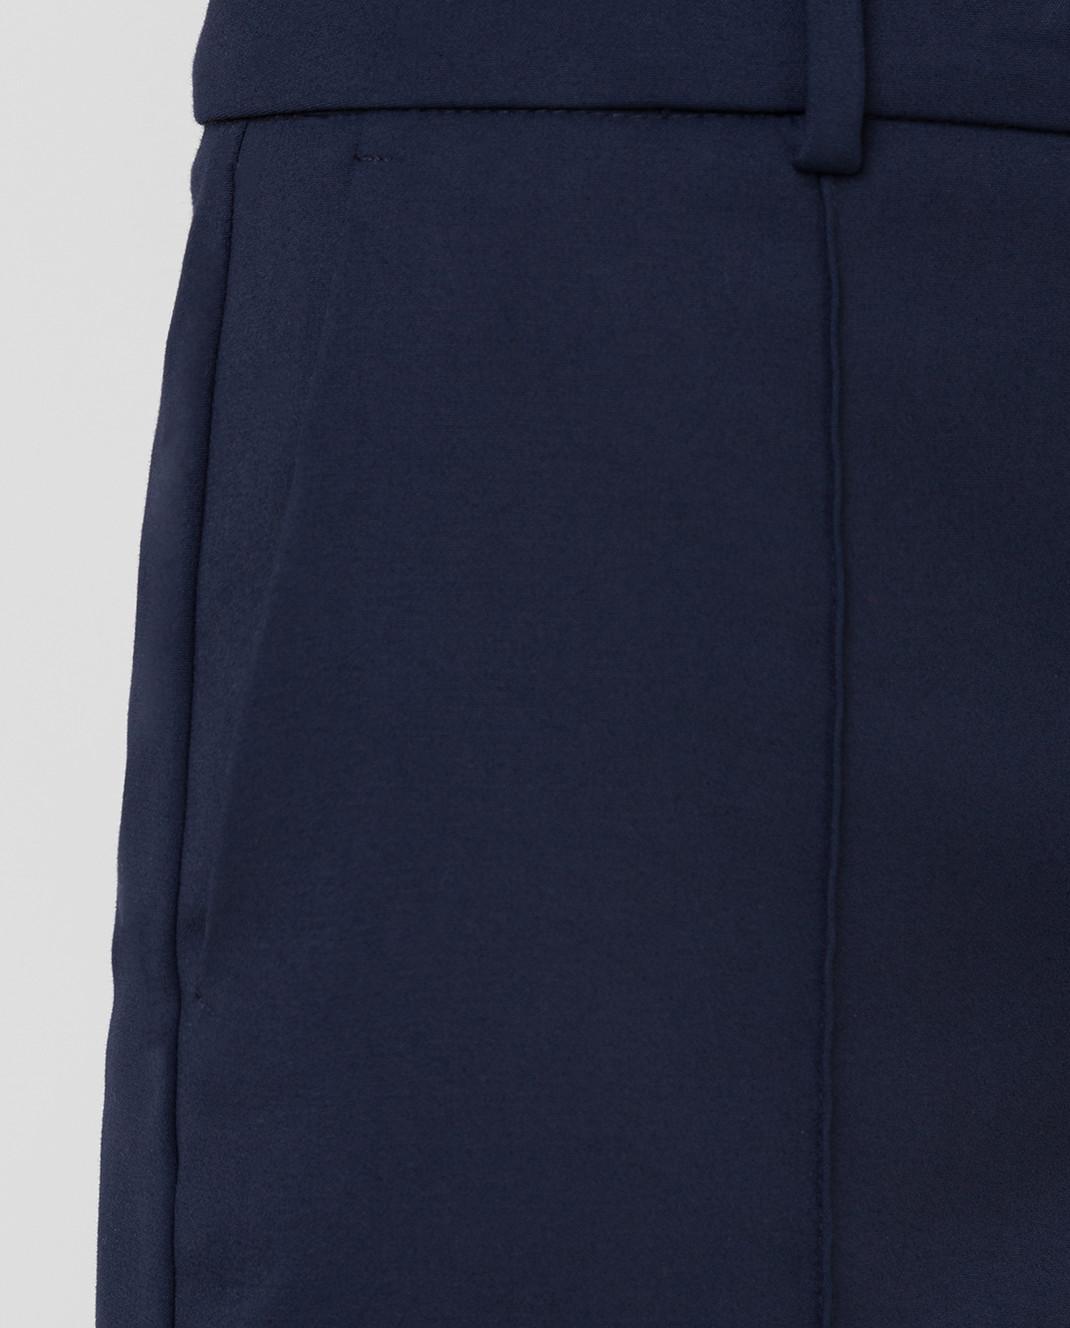 Max Mara Sportmax Темно-синие брюки FATA изображение 5